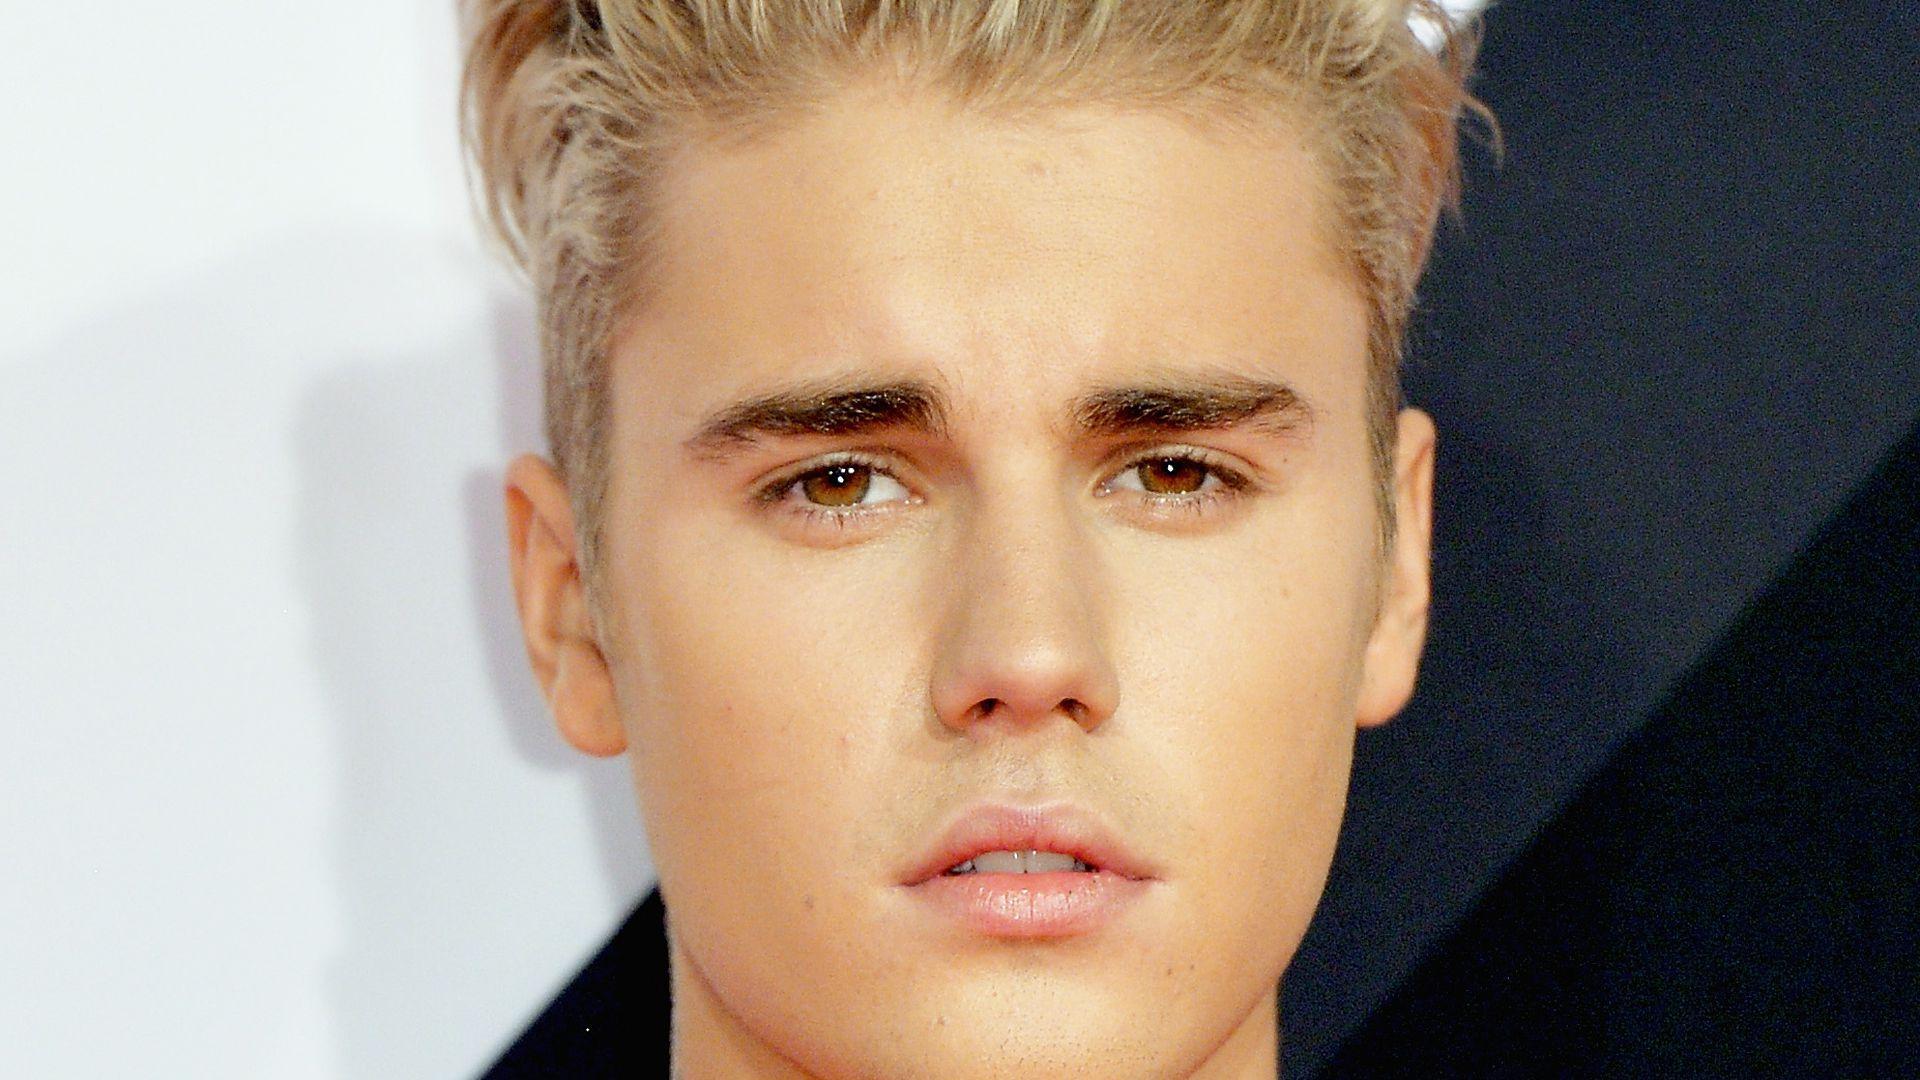 Alles Auf Anfang Justin Bieber Mit Neu Alter Bubi Frisur